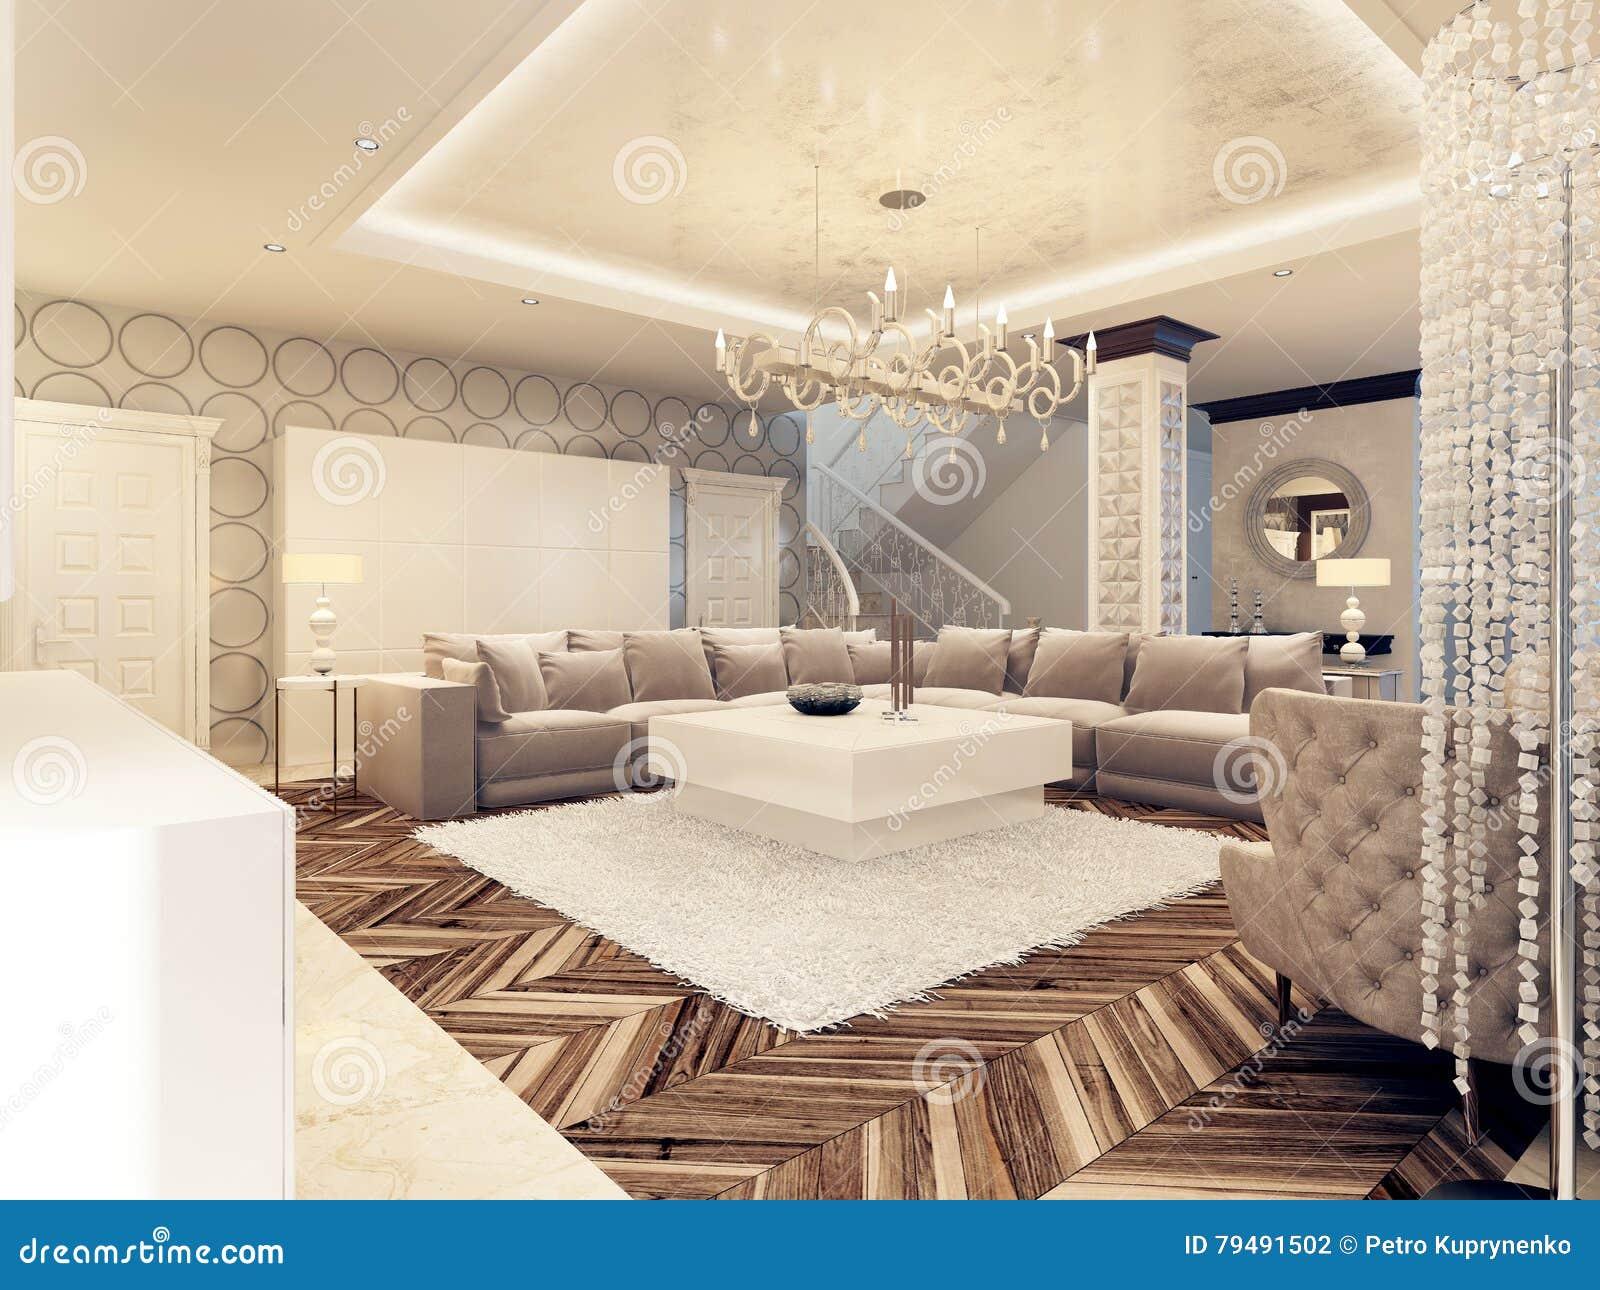 beautiful modern large bright living room royalty free stock image 24268708. Black Bedroom Furniture Sets. Home Design Ideas